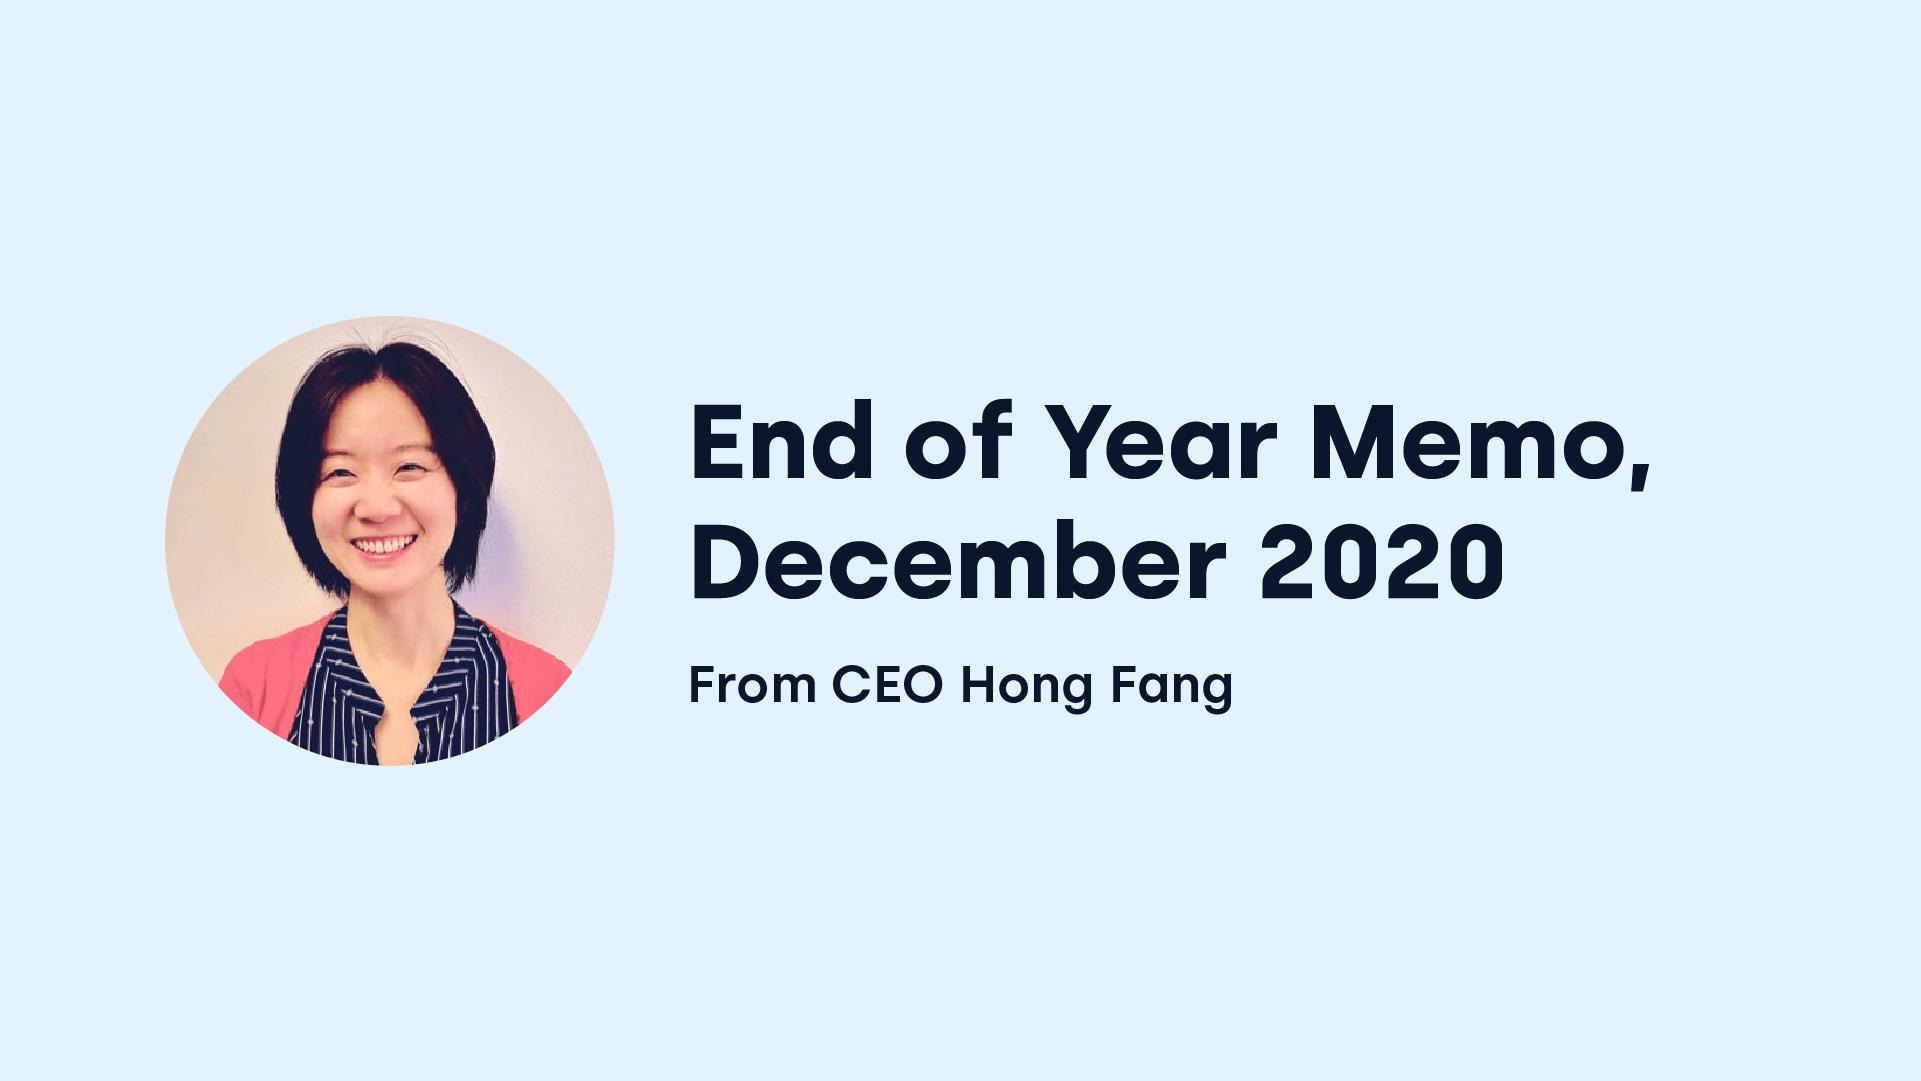 OKCoin CEO Hong Fang End of Year Memo 2020